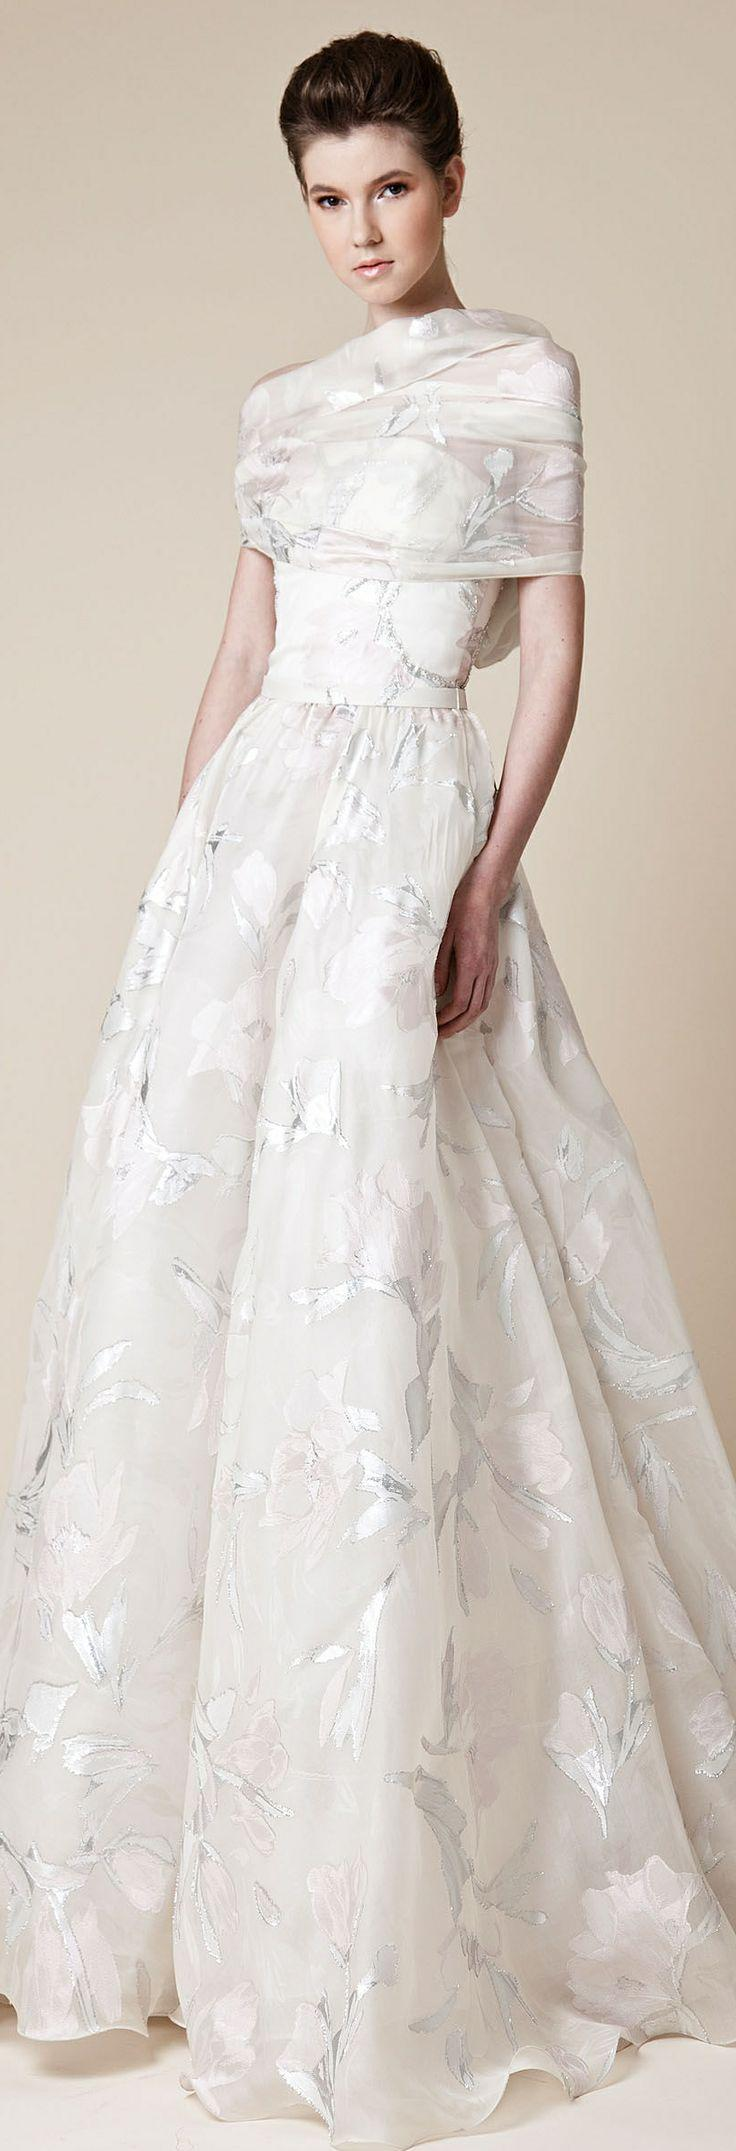 Mariage - ◕‿ Edgy Fashion Style ◉